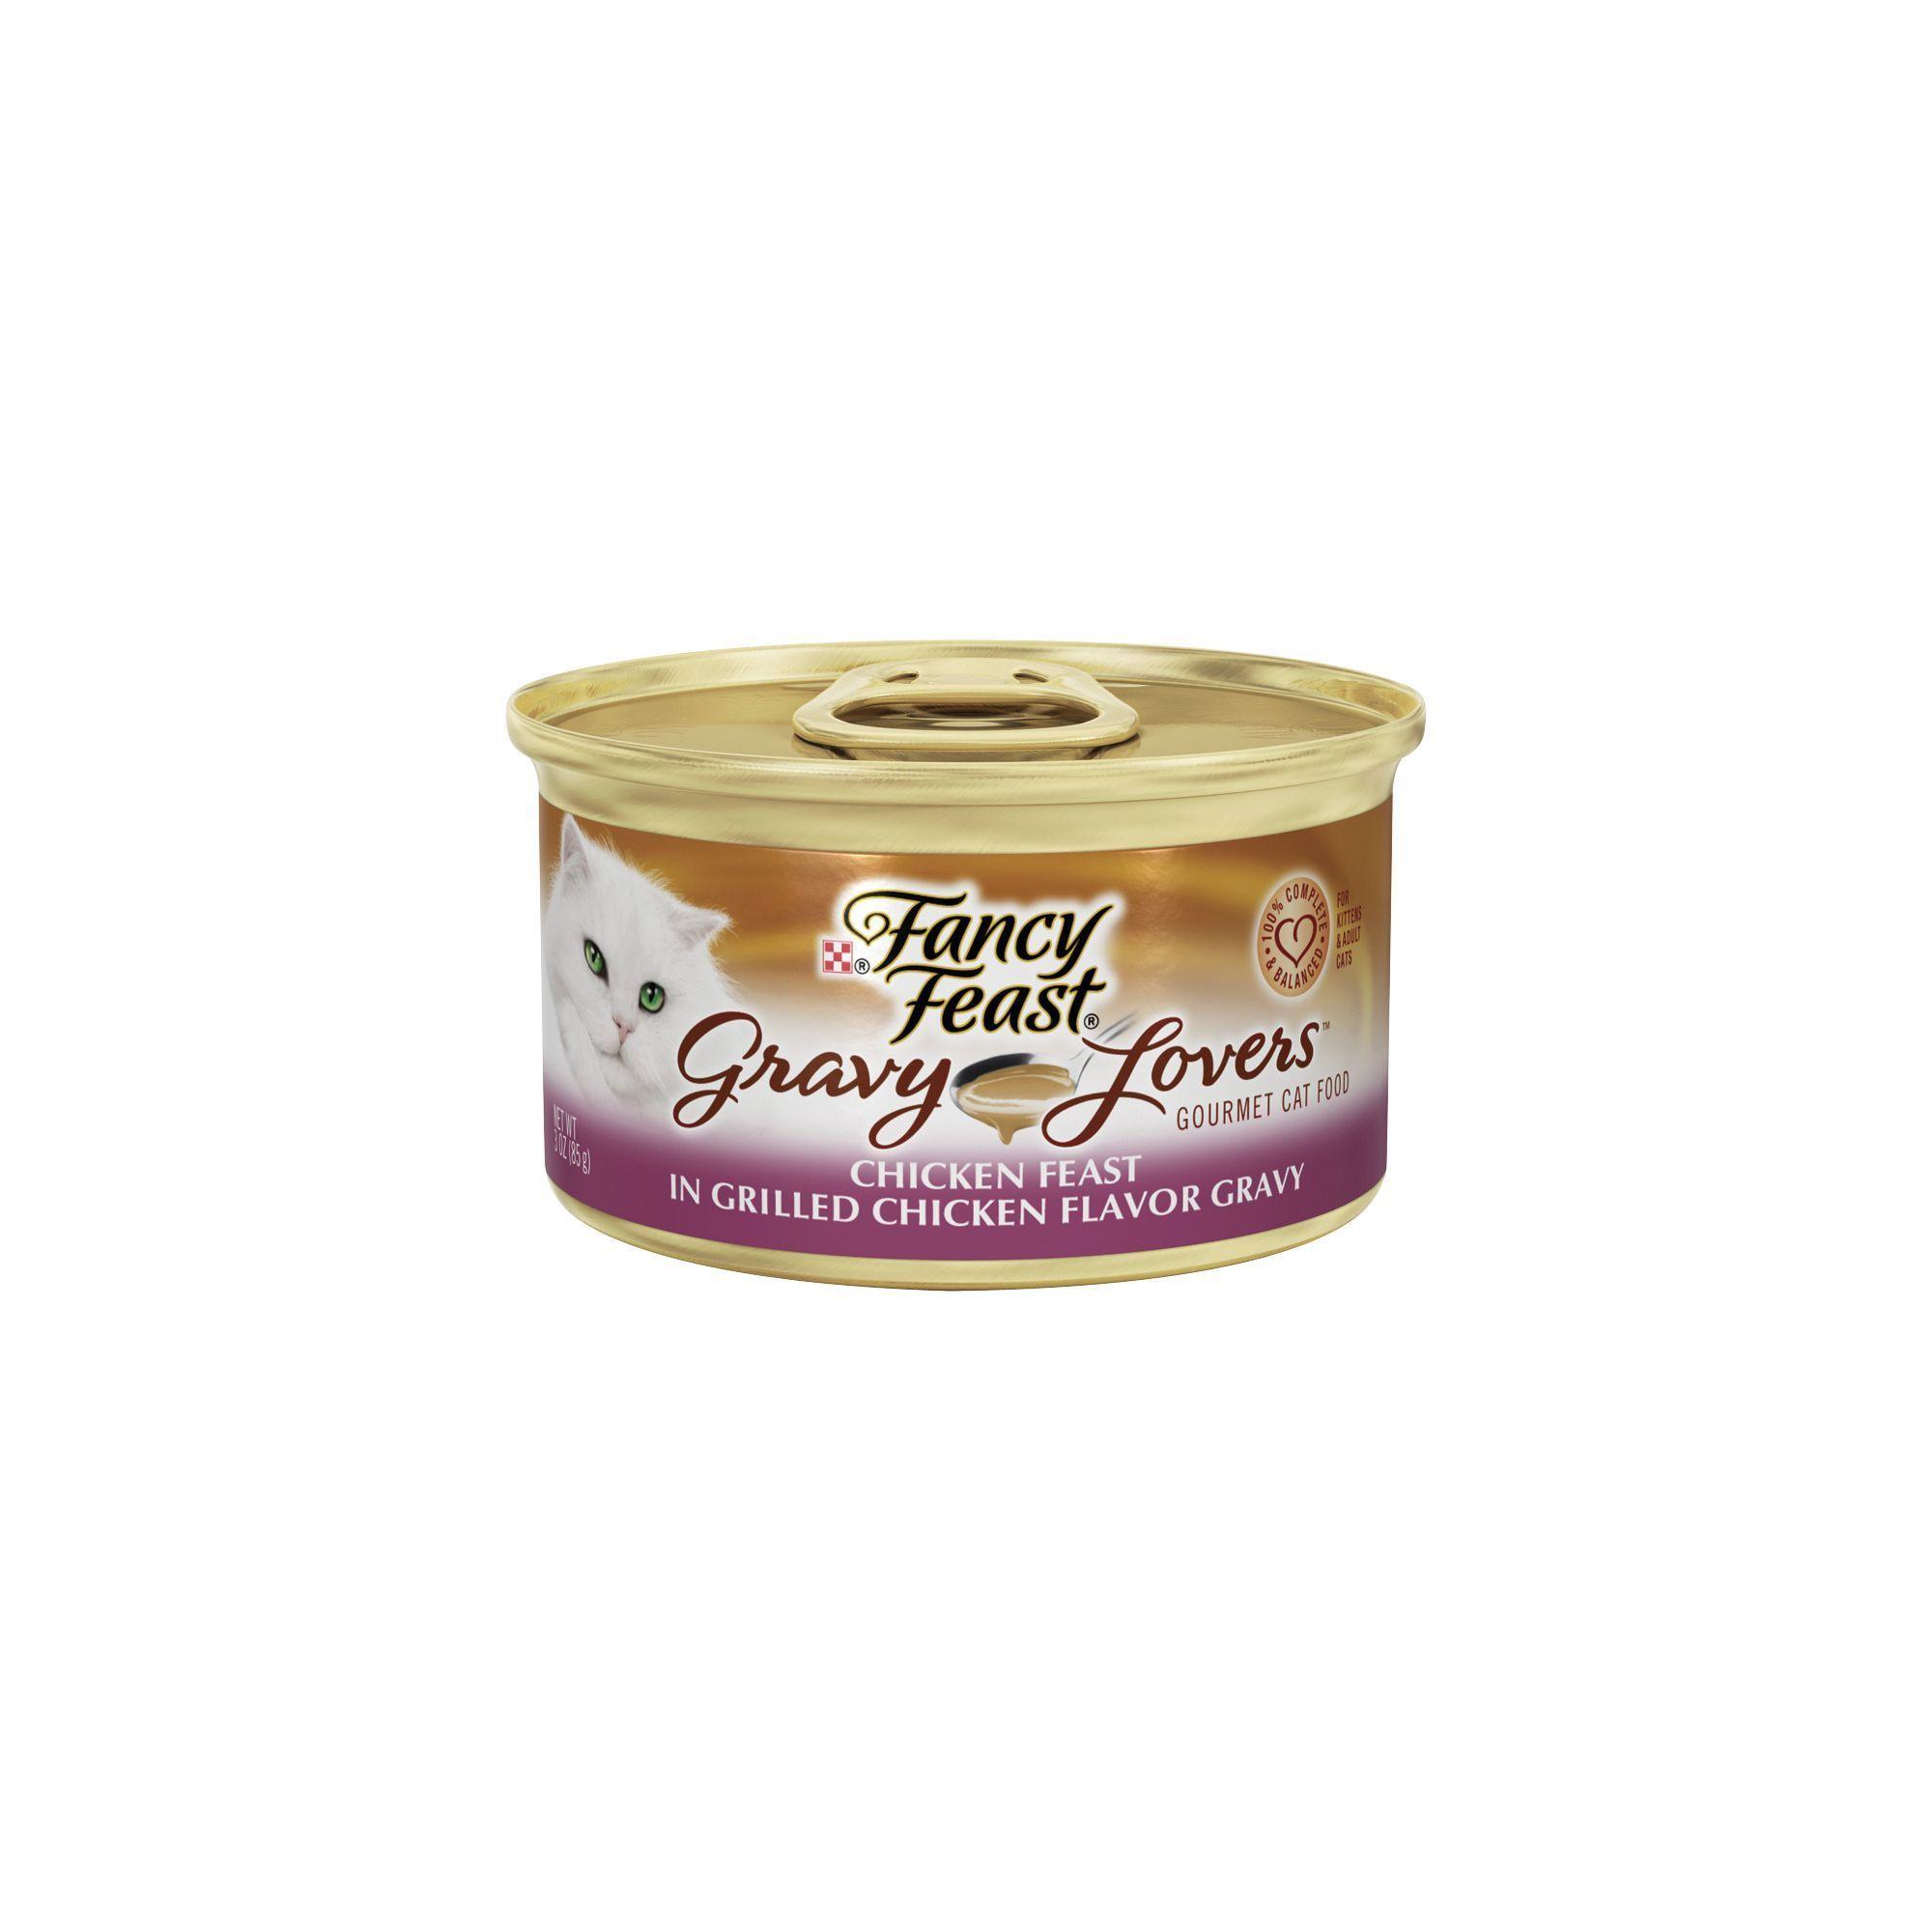 Cat food storage fancy feast gravy lovers adult cat food